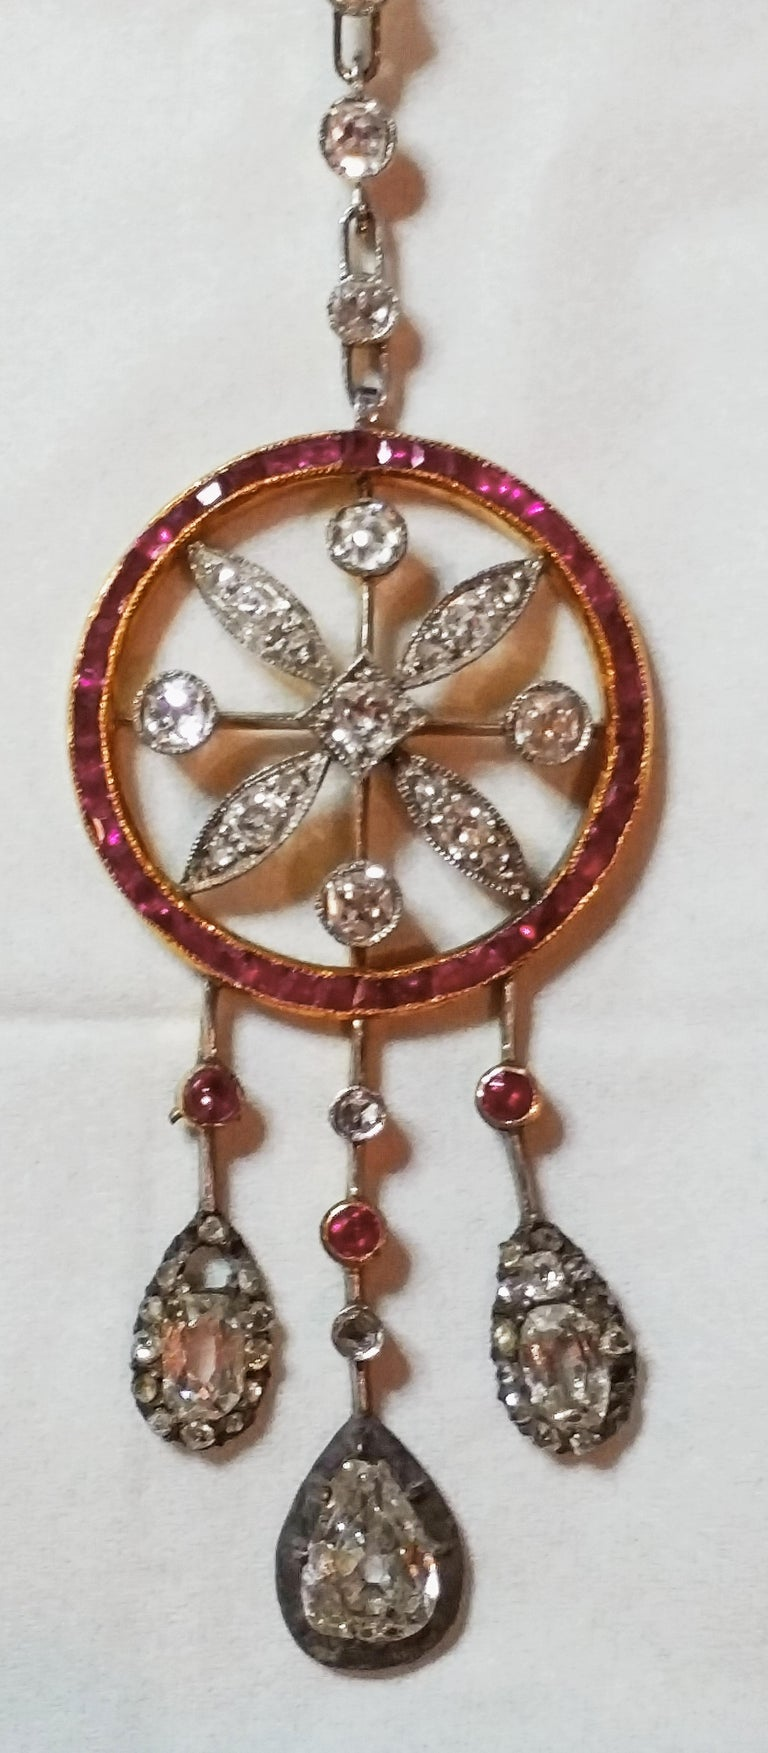 Old European Cut Art Nouveau Necklace Gold 585 Diamonds '3.0 Carat' Rubies Vienna Austria c.1910 For Sale